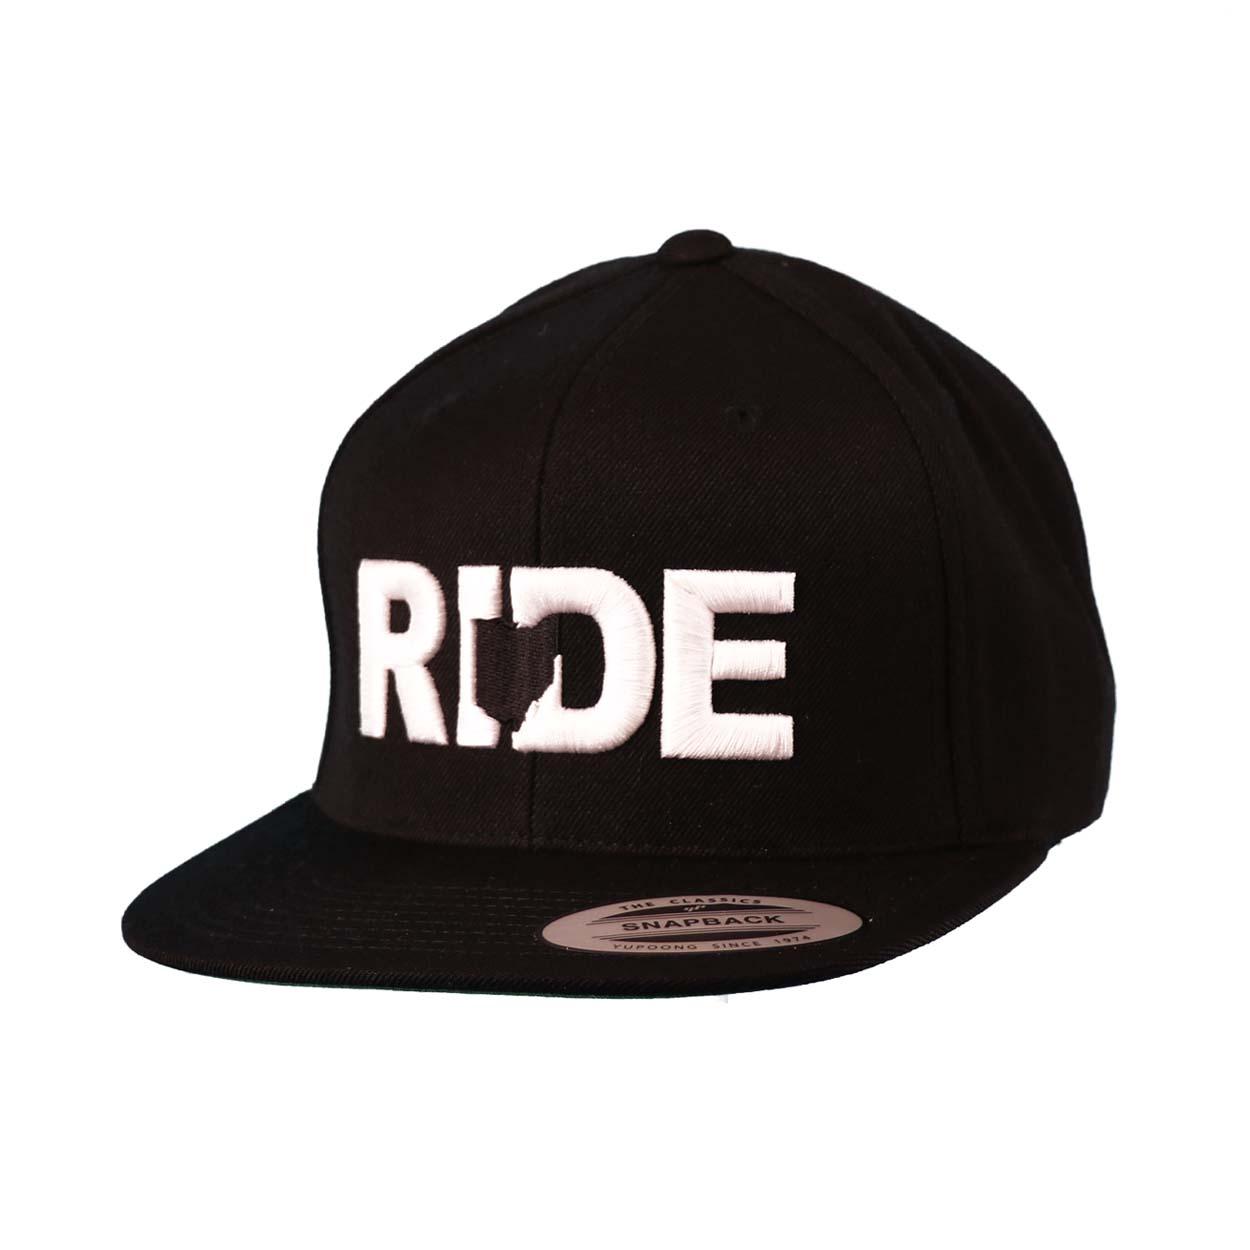 Ride Ohio Hat Classic Embroidered  Snapback Flat Brim Hat Black/White